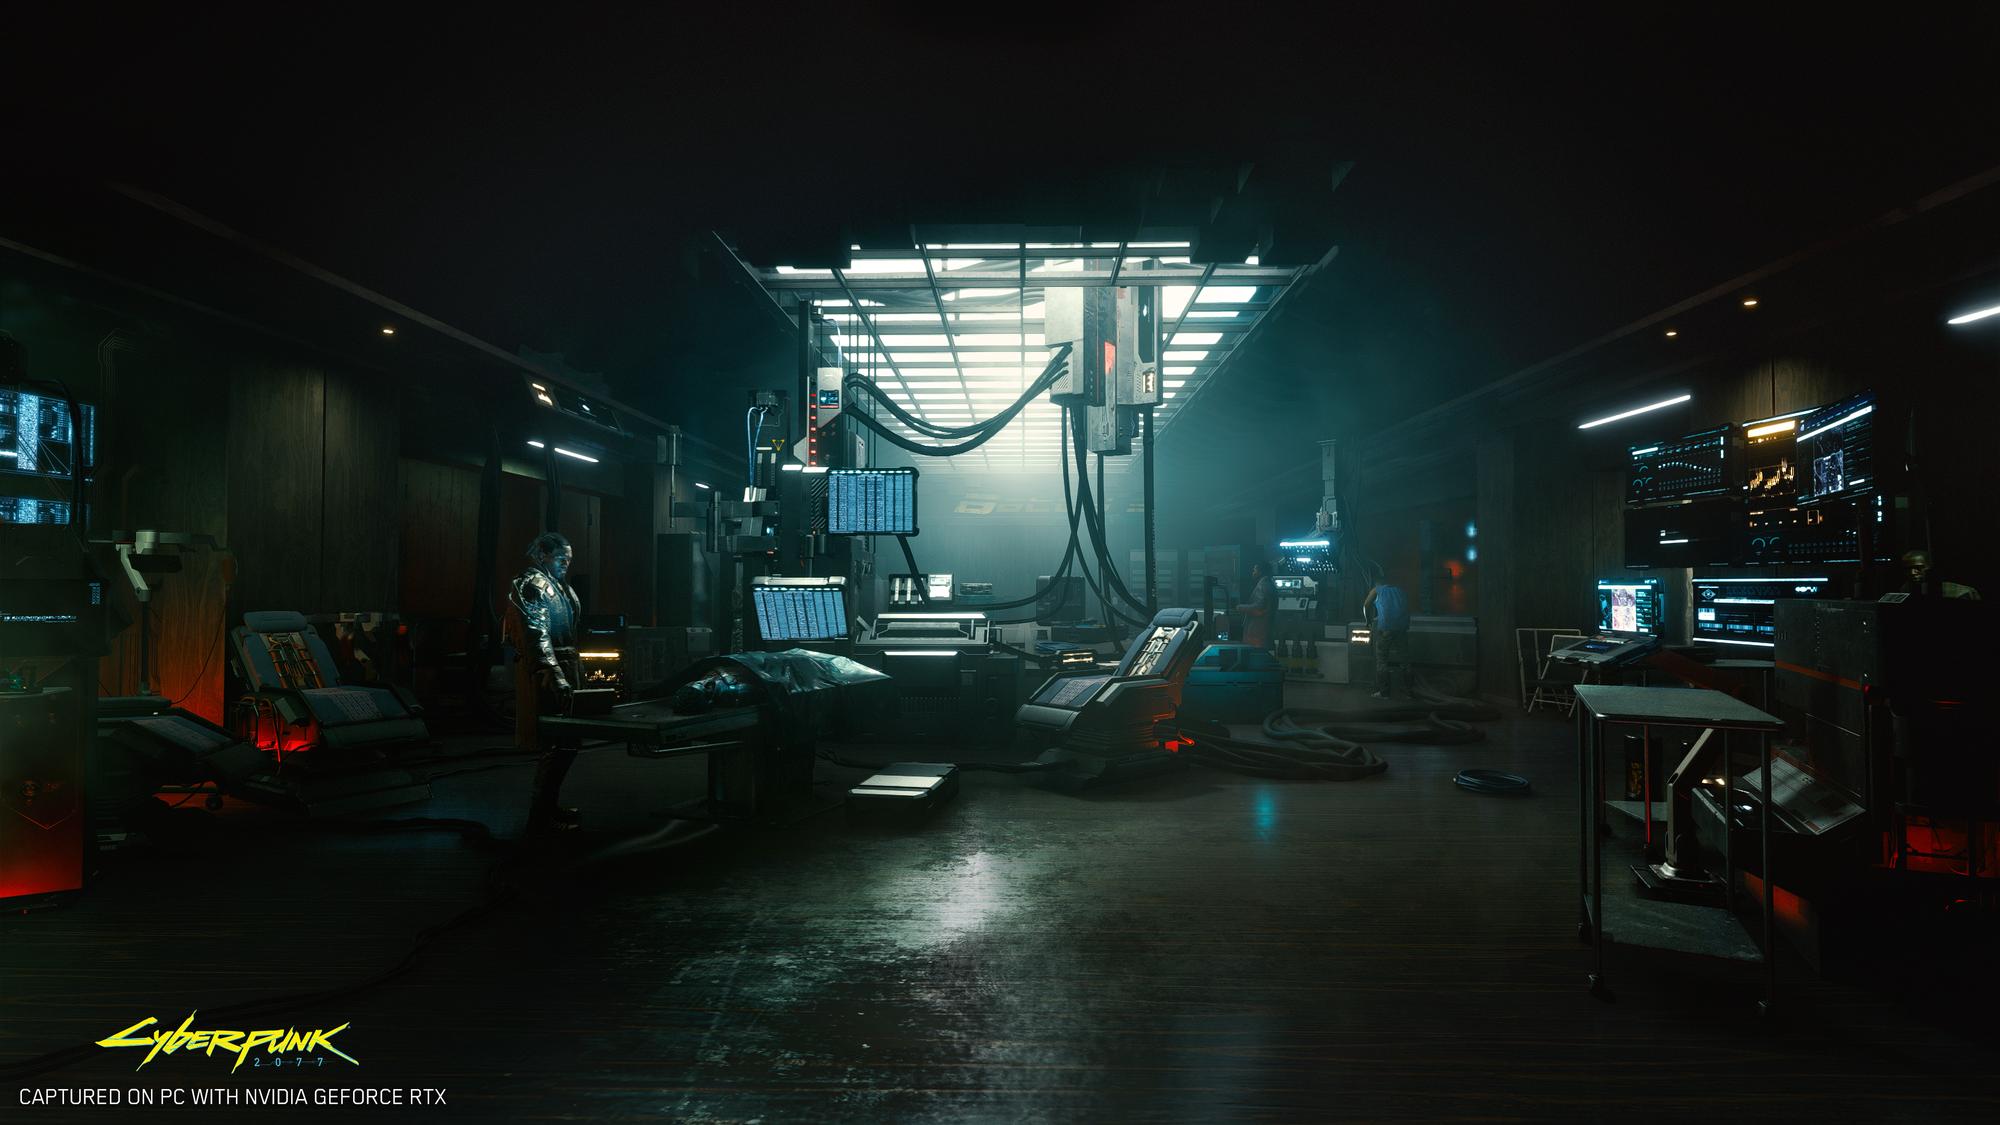 cyberpunk-2077-nvidia-geforce-e3-2019-rtx-on-exclusive-4k-in-game-screenshot-001.png